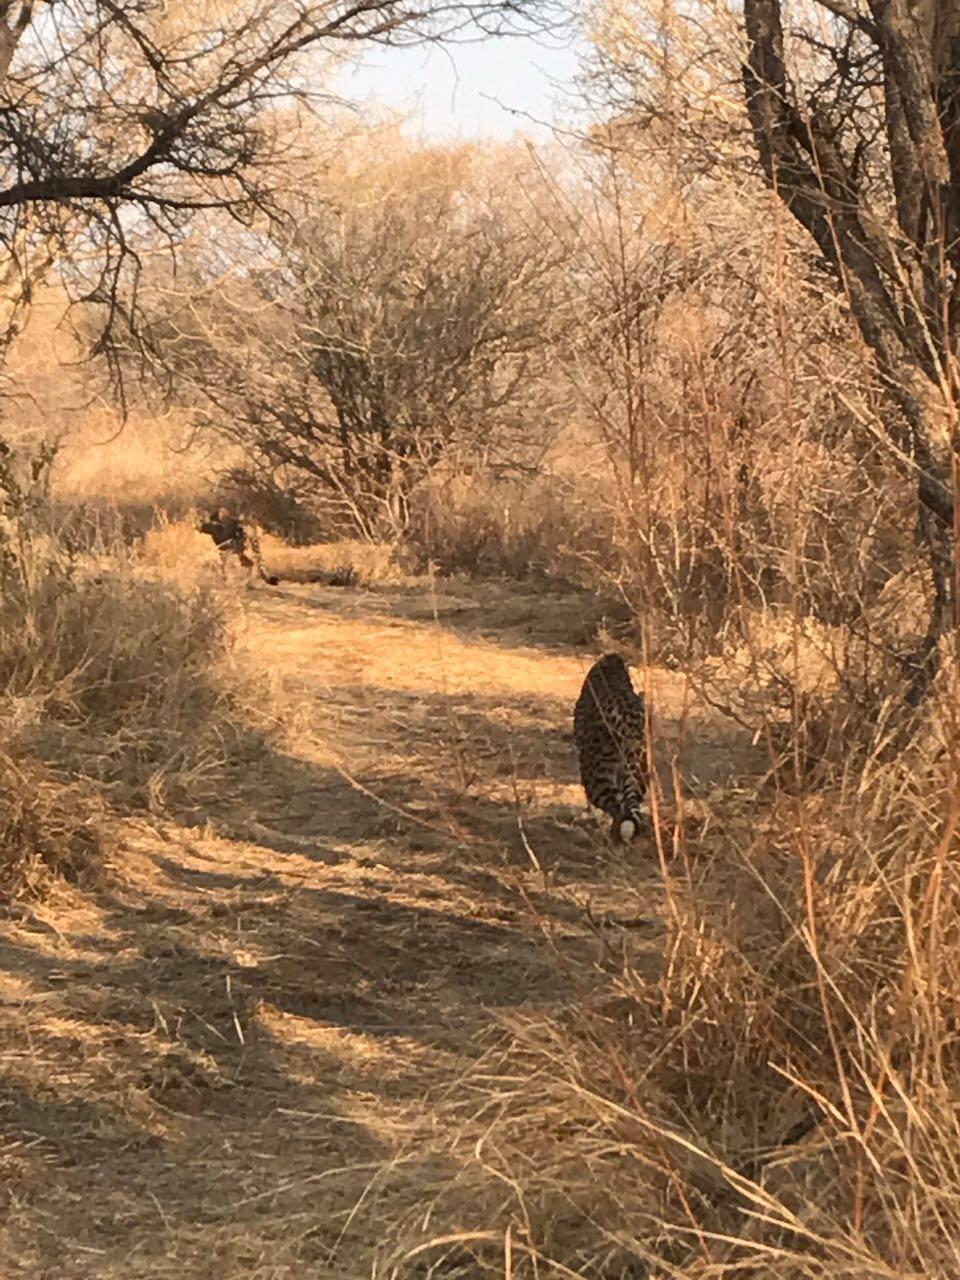 cheetah release 4